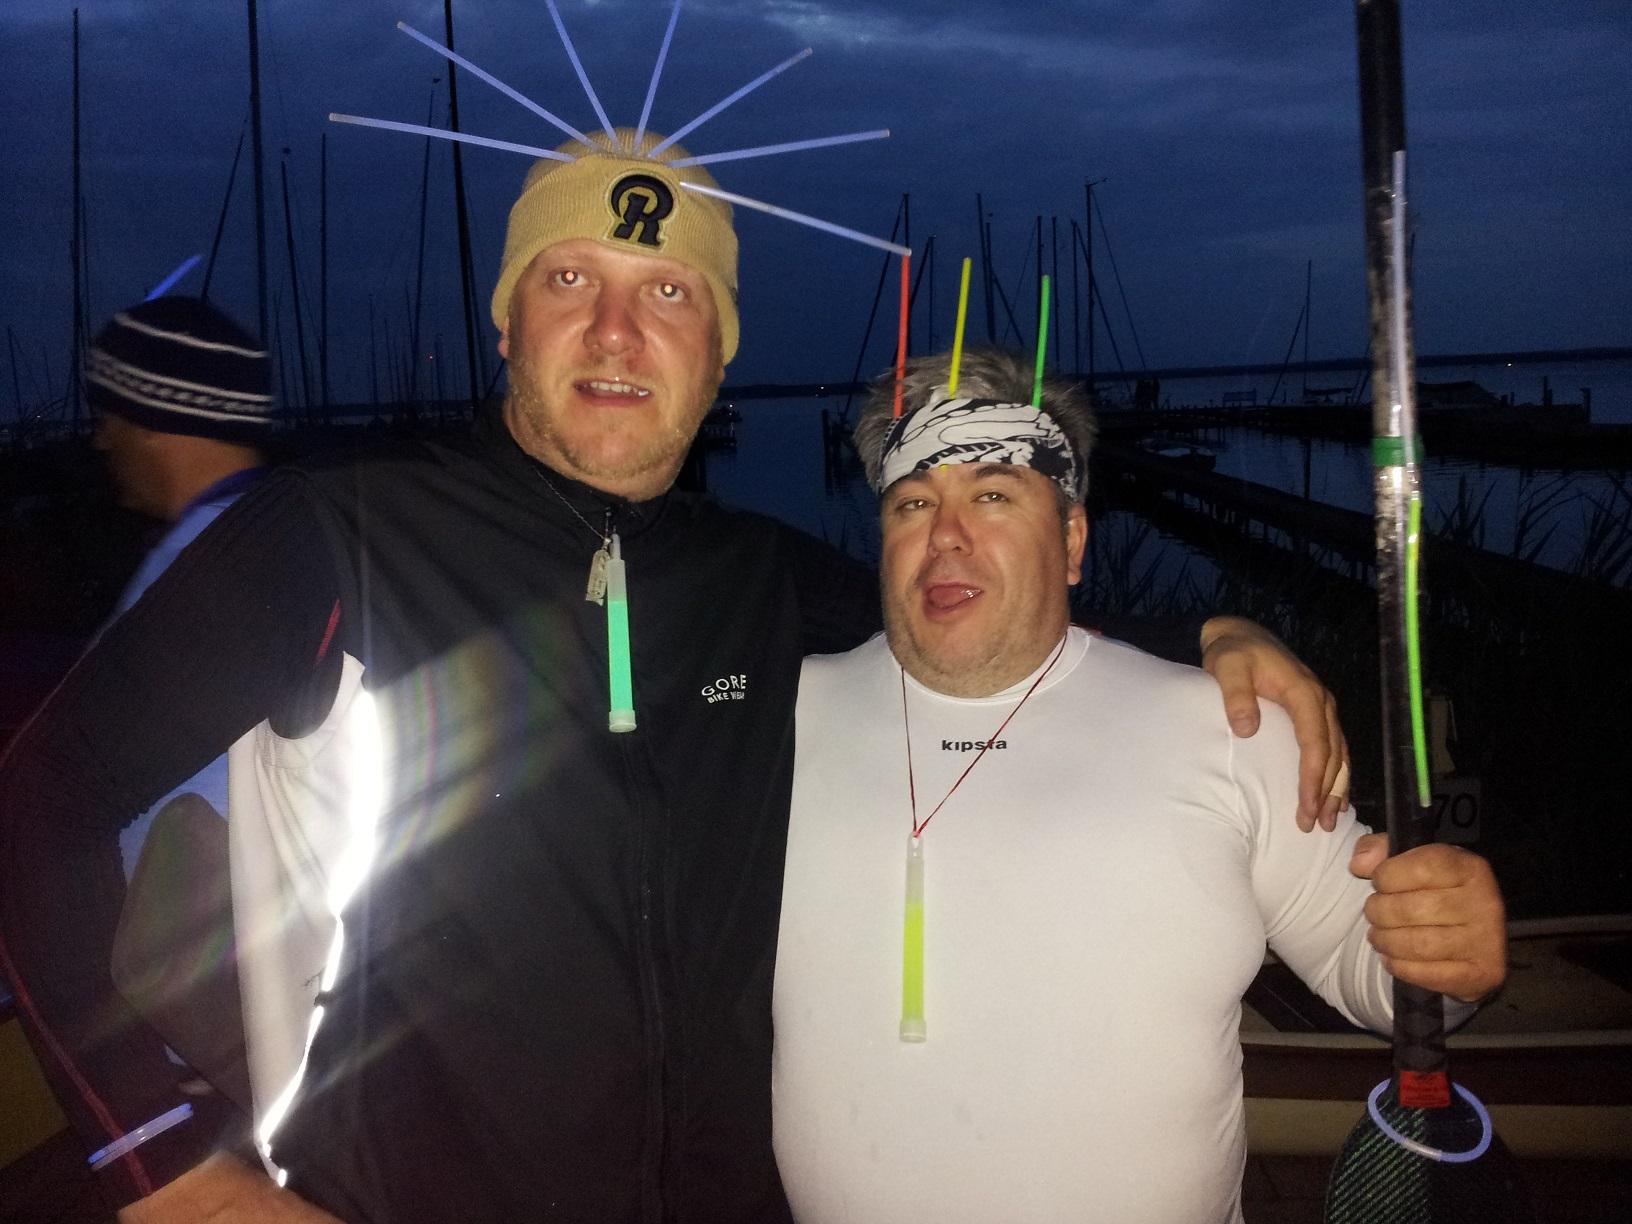 Markus Zapfe & Jens Gregor